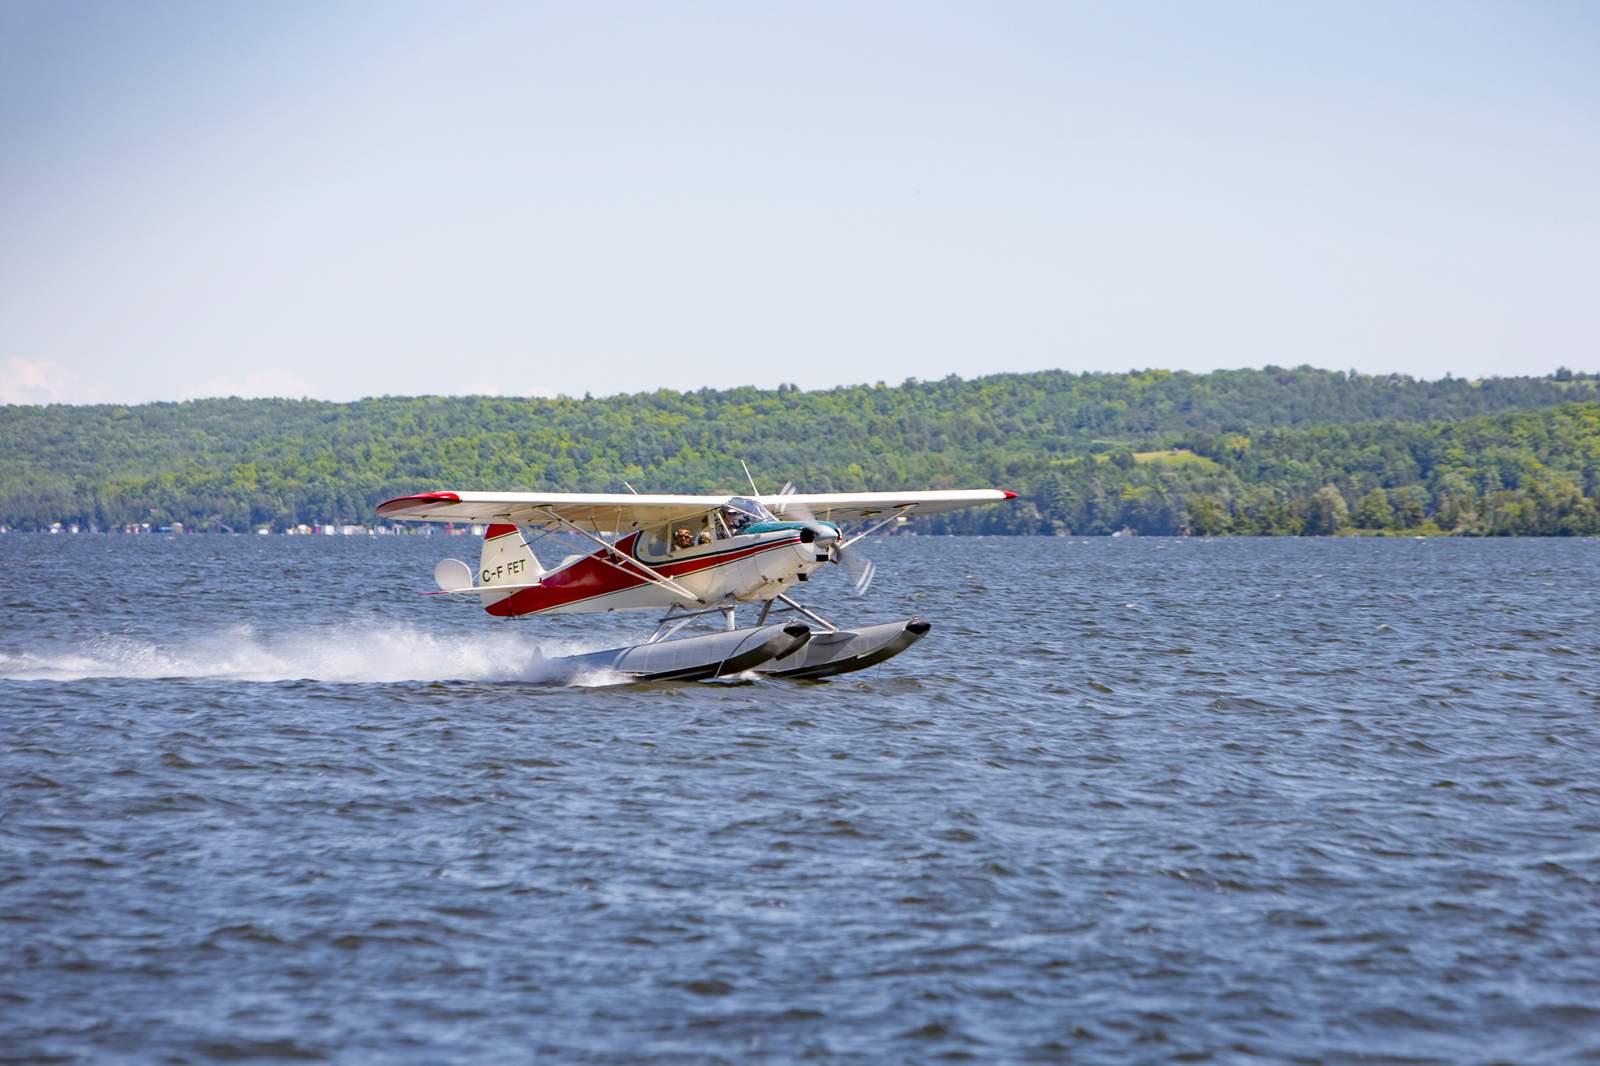 Ausflug mit dem Wasserflugzeug